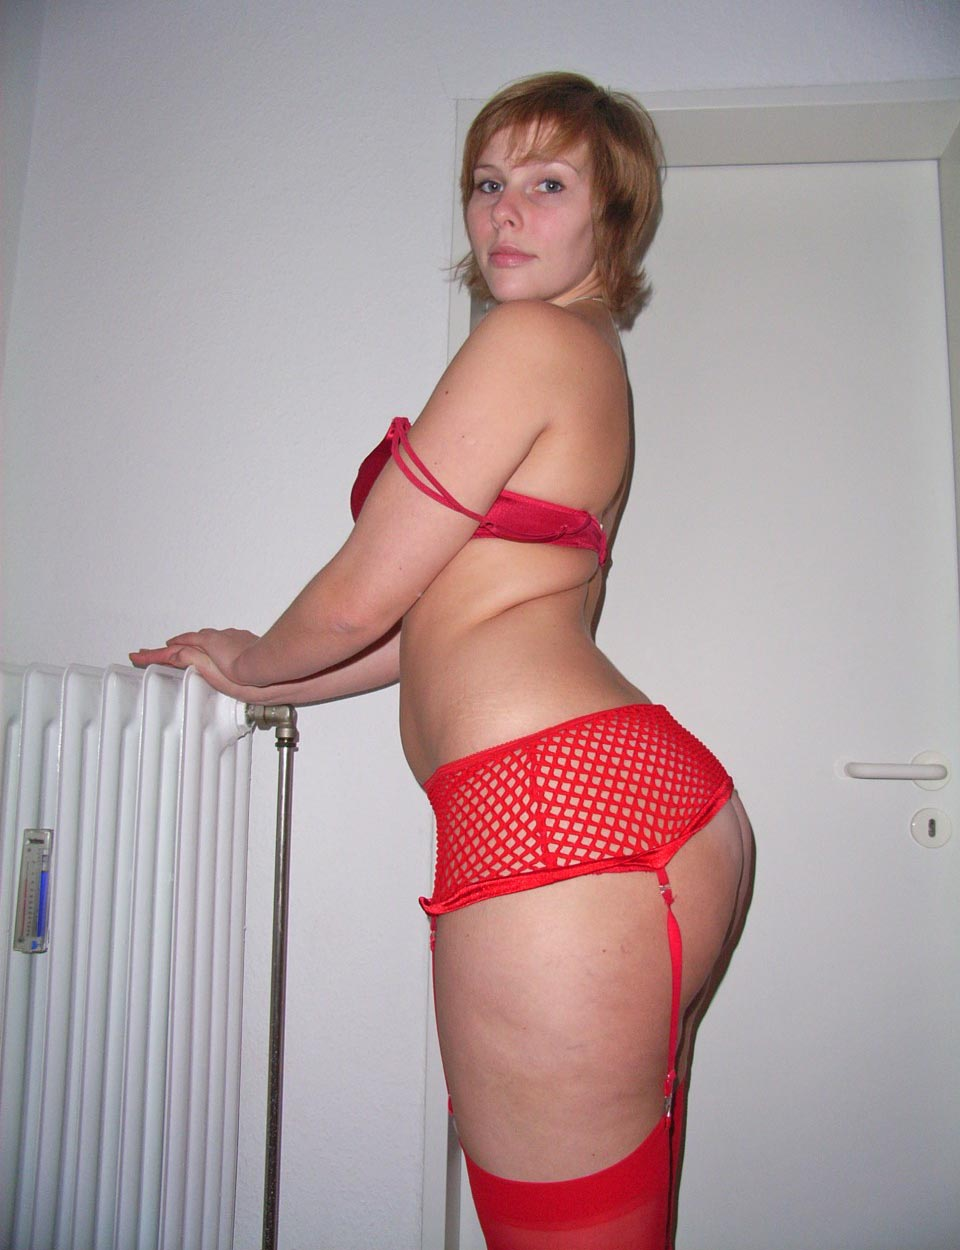 Femme en lingerie rouge